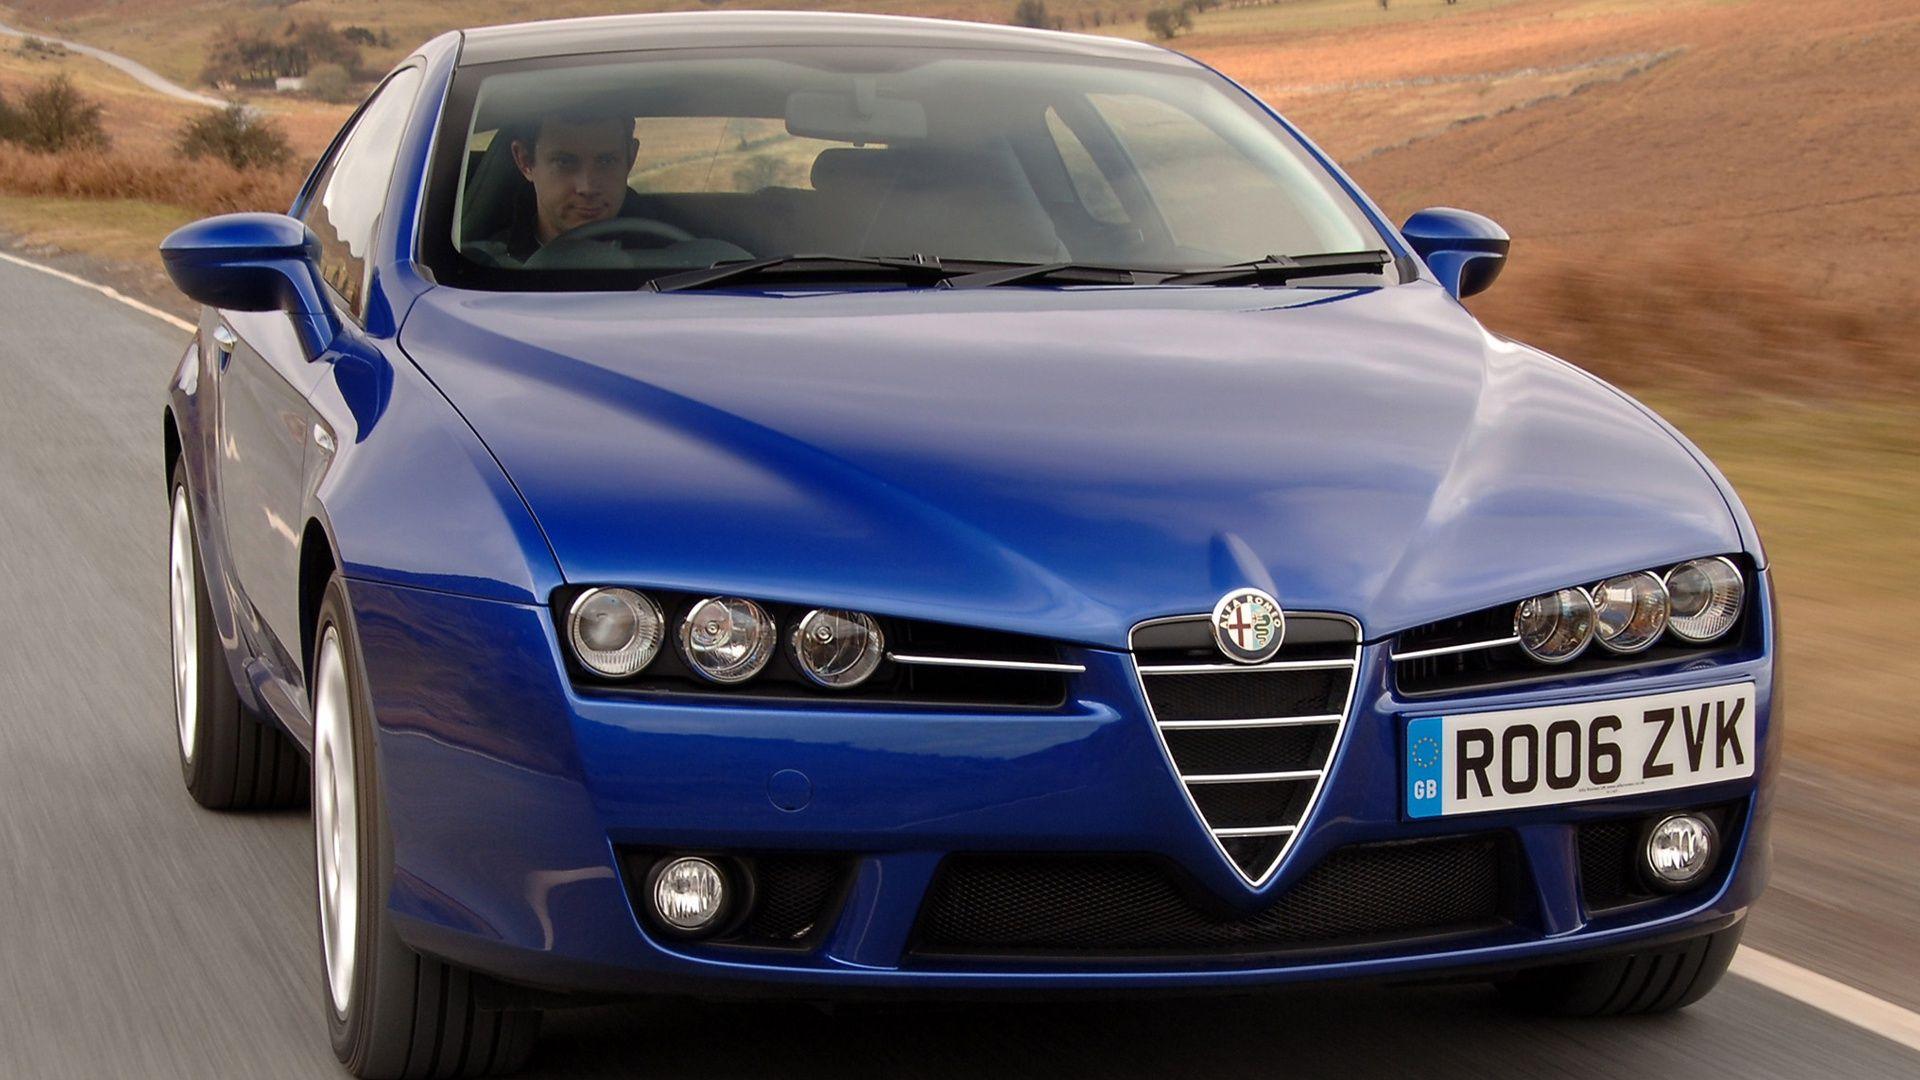 Alfa romeo brera in blue cool shot for your desktop